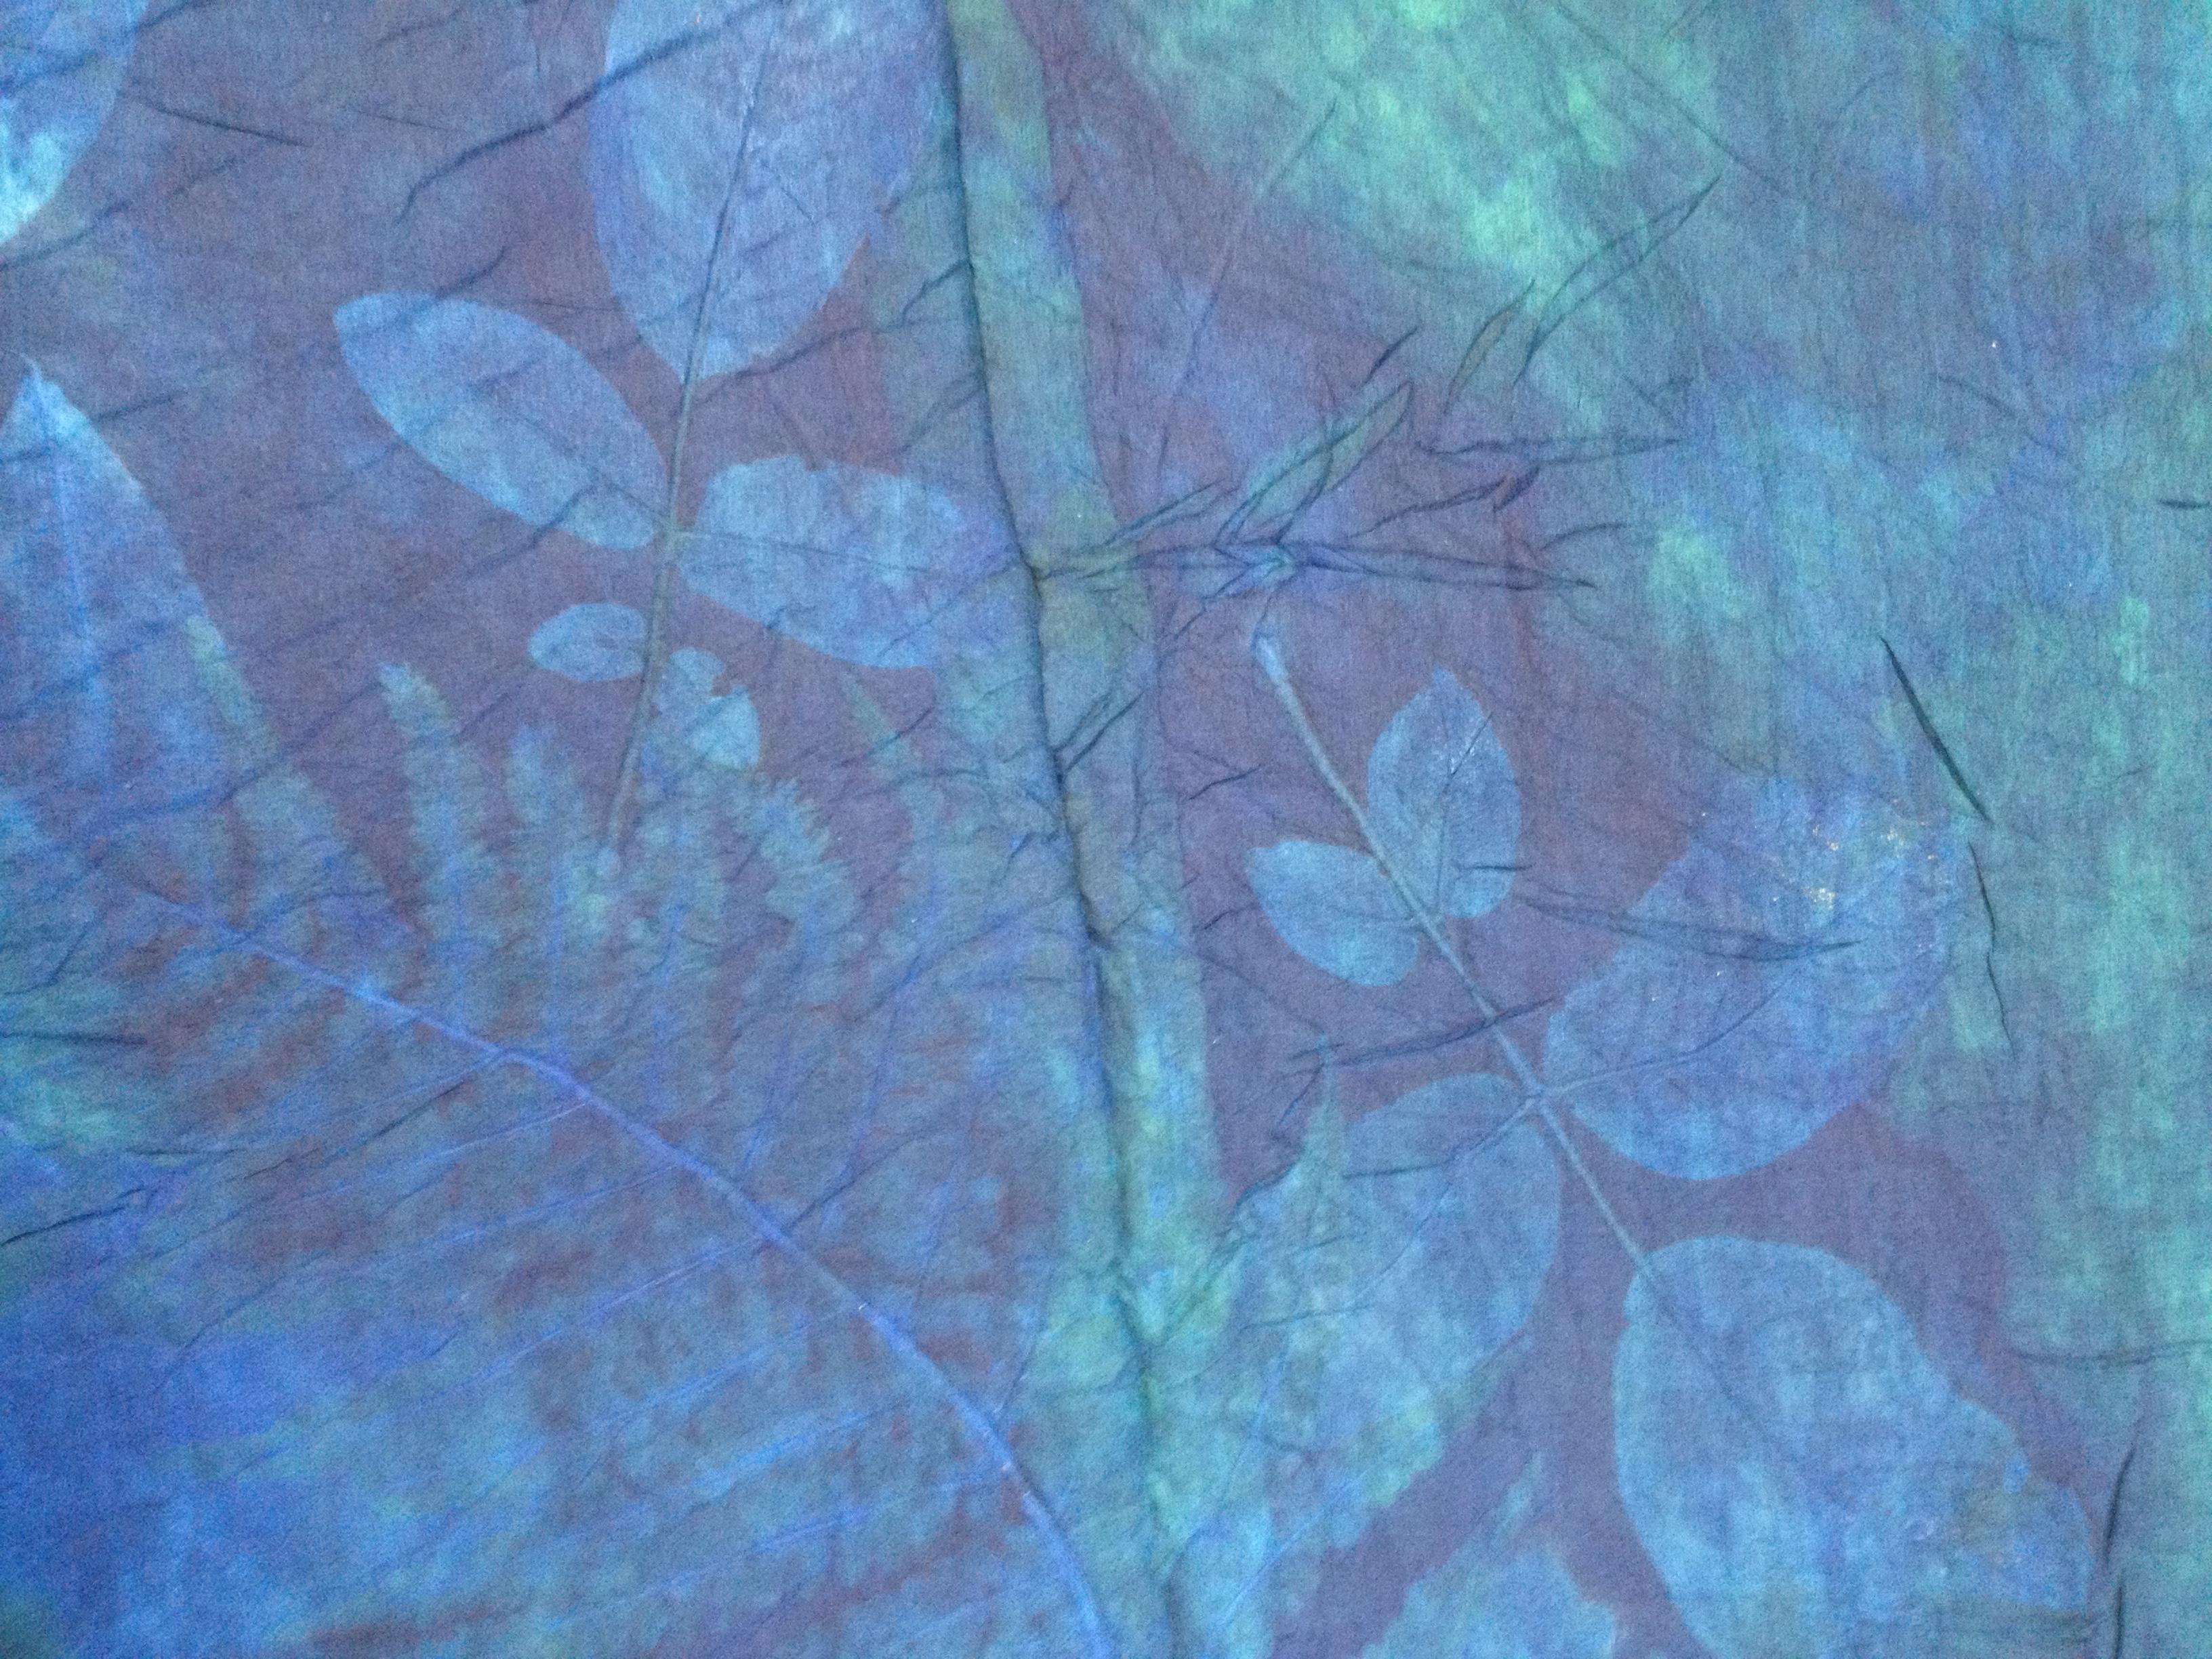 blauwe bladerenafdruk indigo